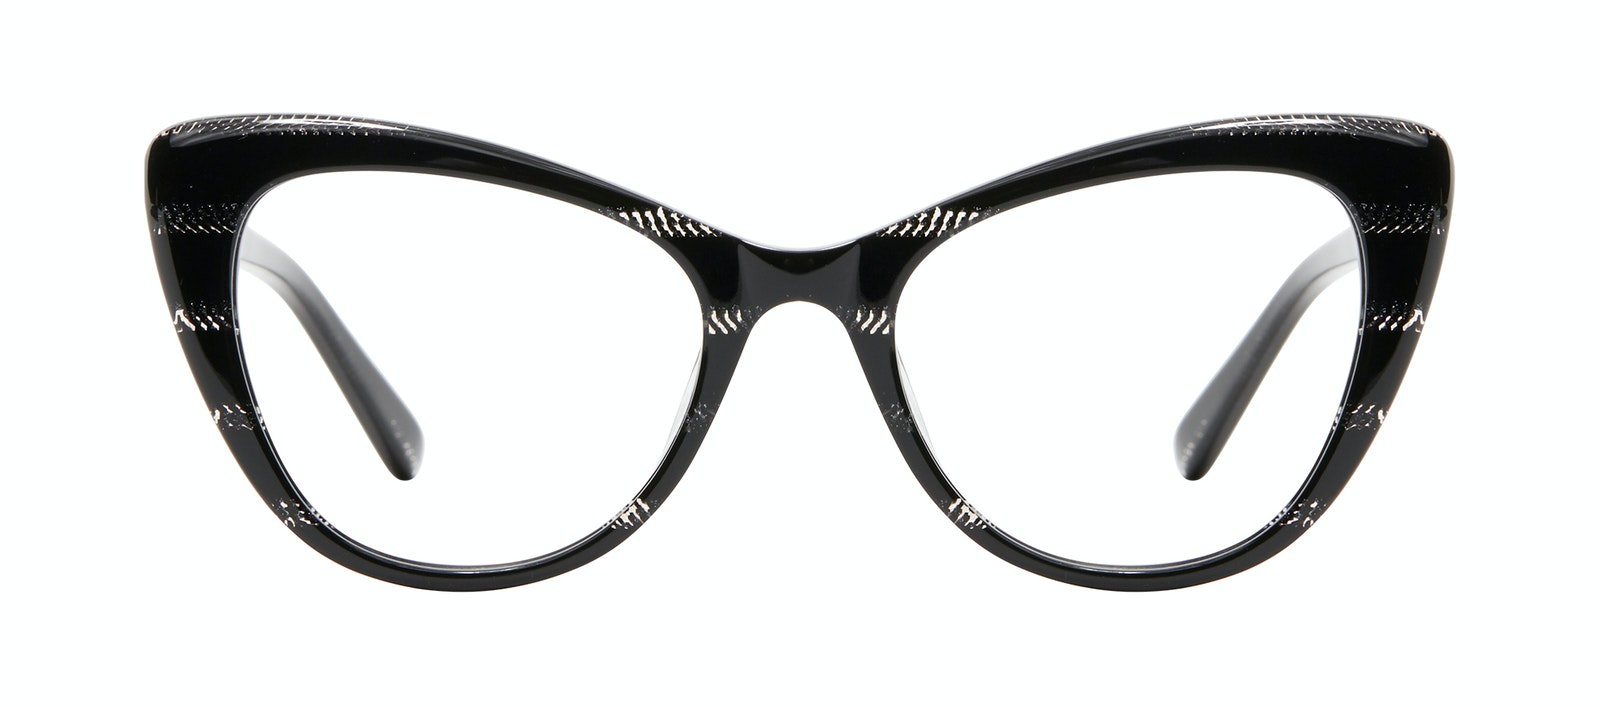 Affordable Fashion Glasses Cat Eye Eyeglasses Women Verve Night Front